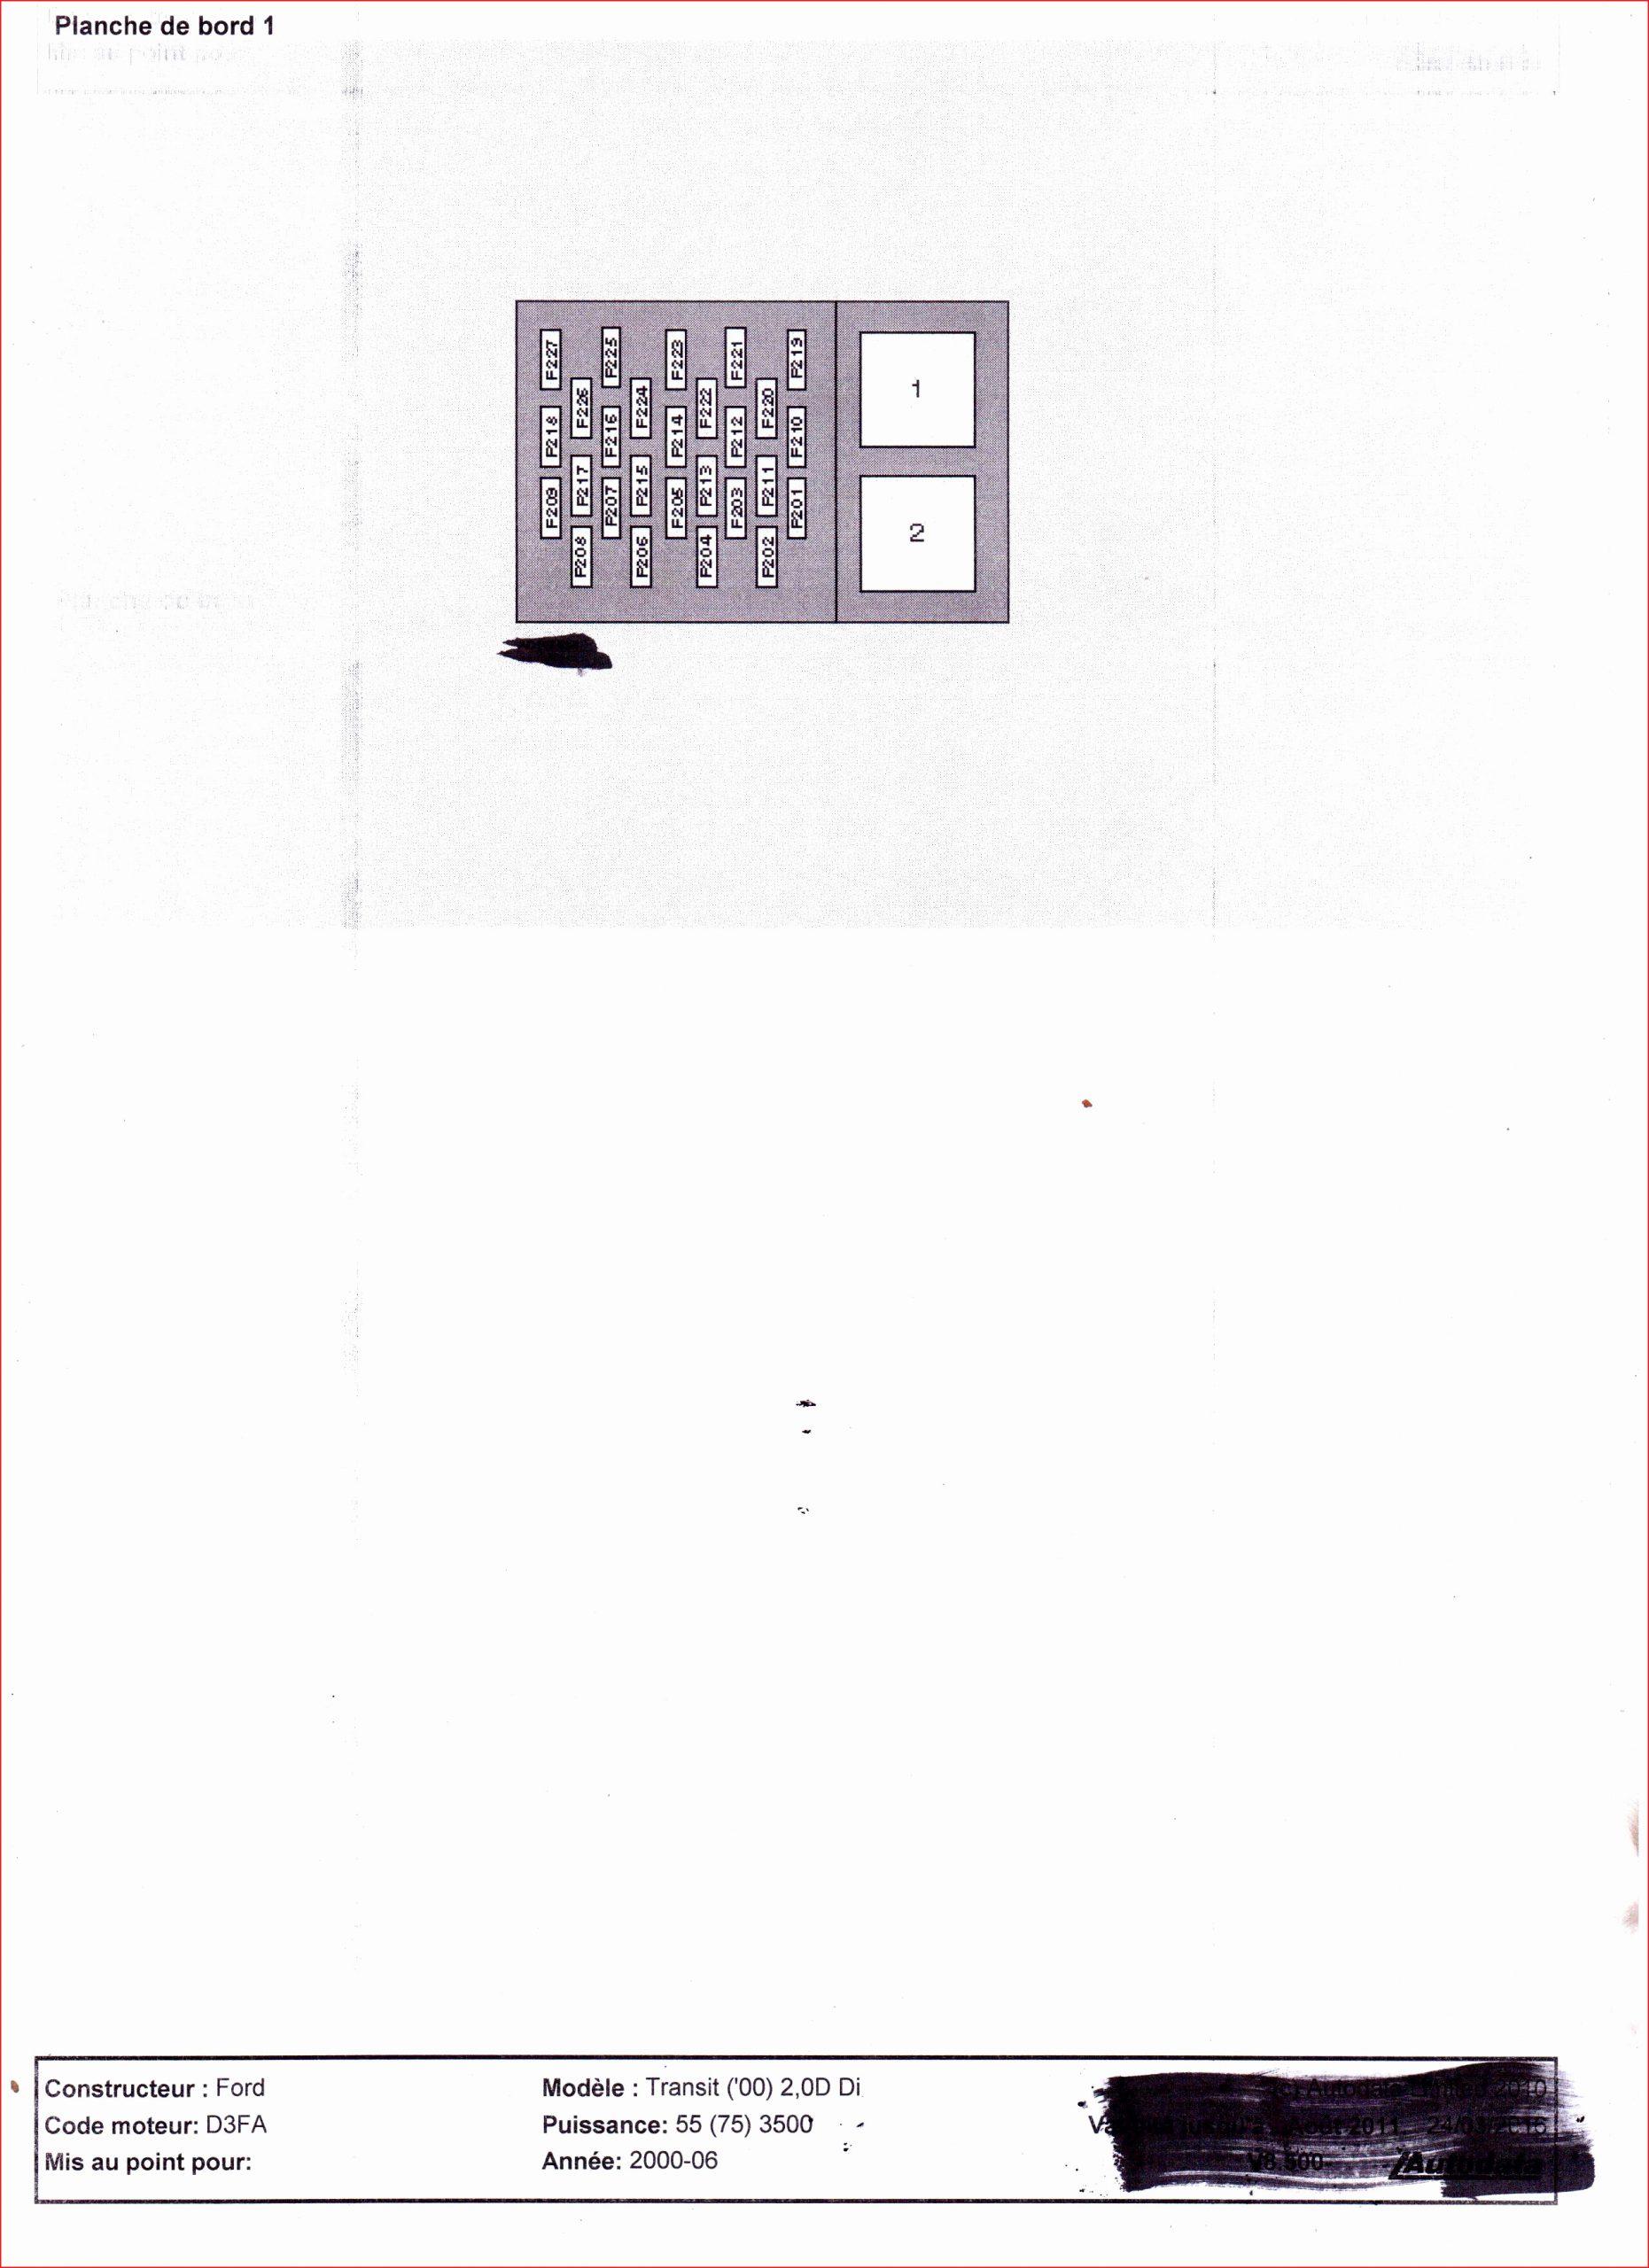 Haut Piscine Filtre Sable Galerie De Piscine Idée 751340 ... avec Pompe Piscine Intex Leroy Merlin